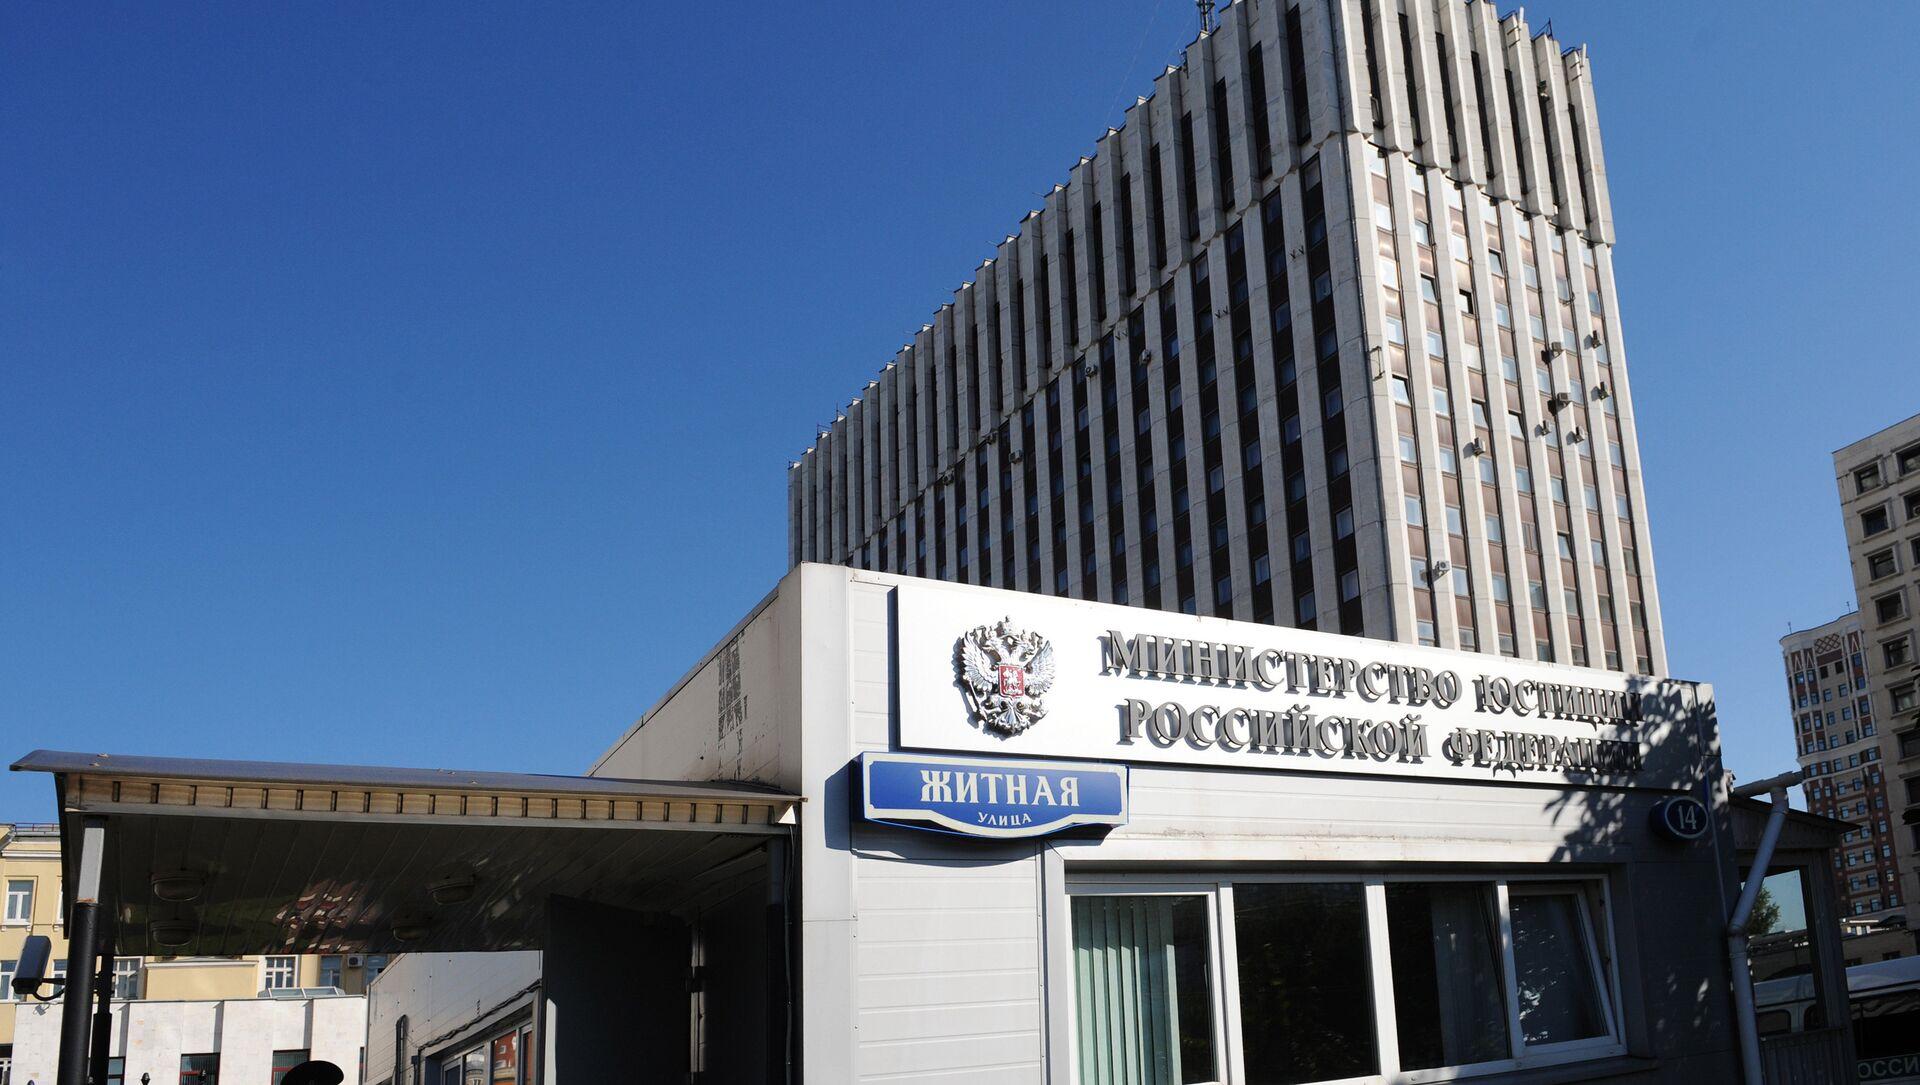 El Ministerio de Justicia de Rusia - Sputnik Mundo, 1920, 28.12.2020